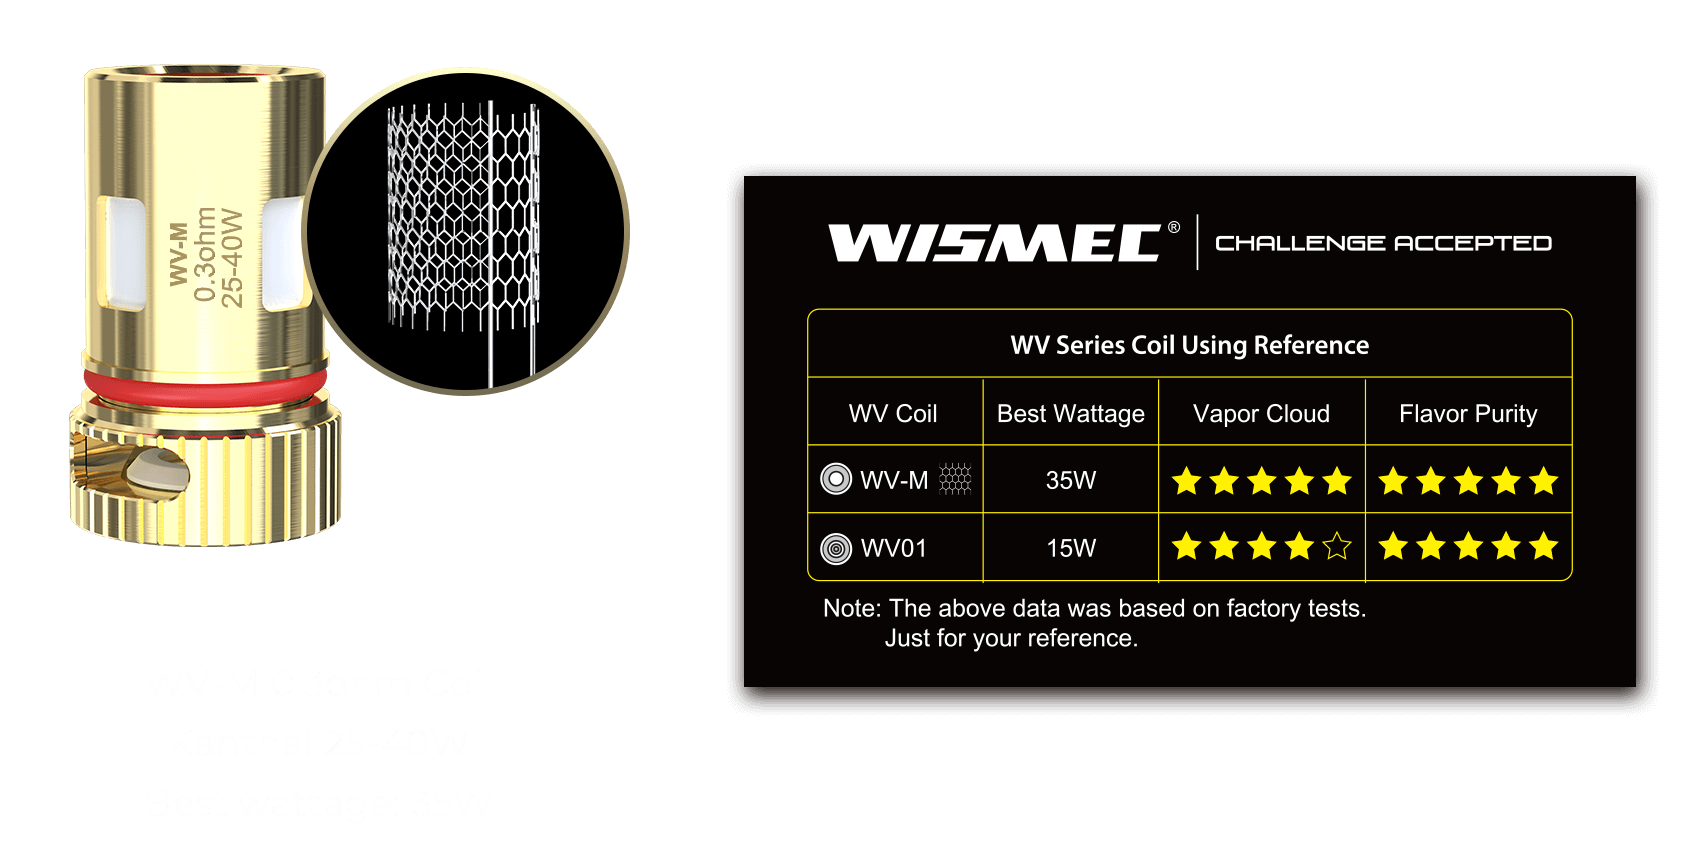 WV01 Single Coil Wattage